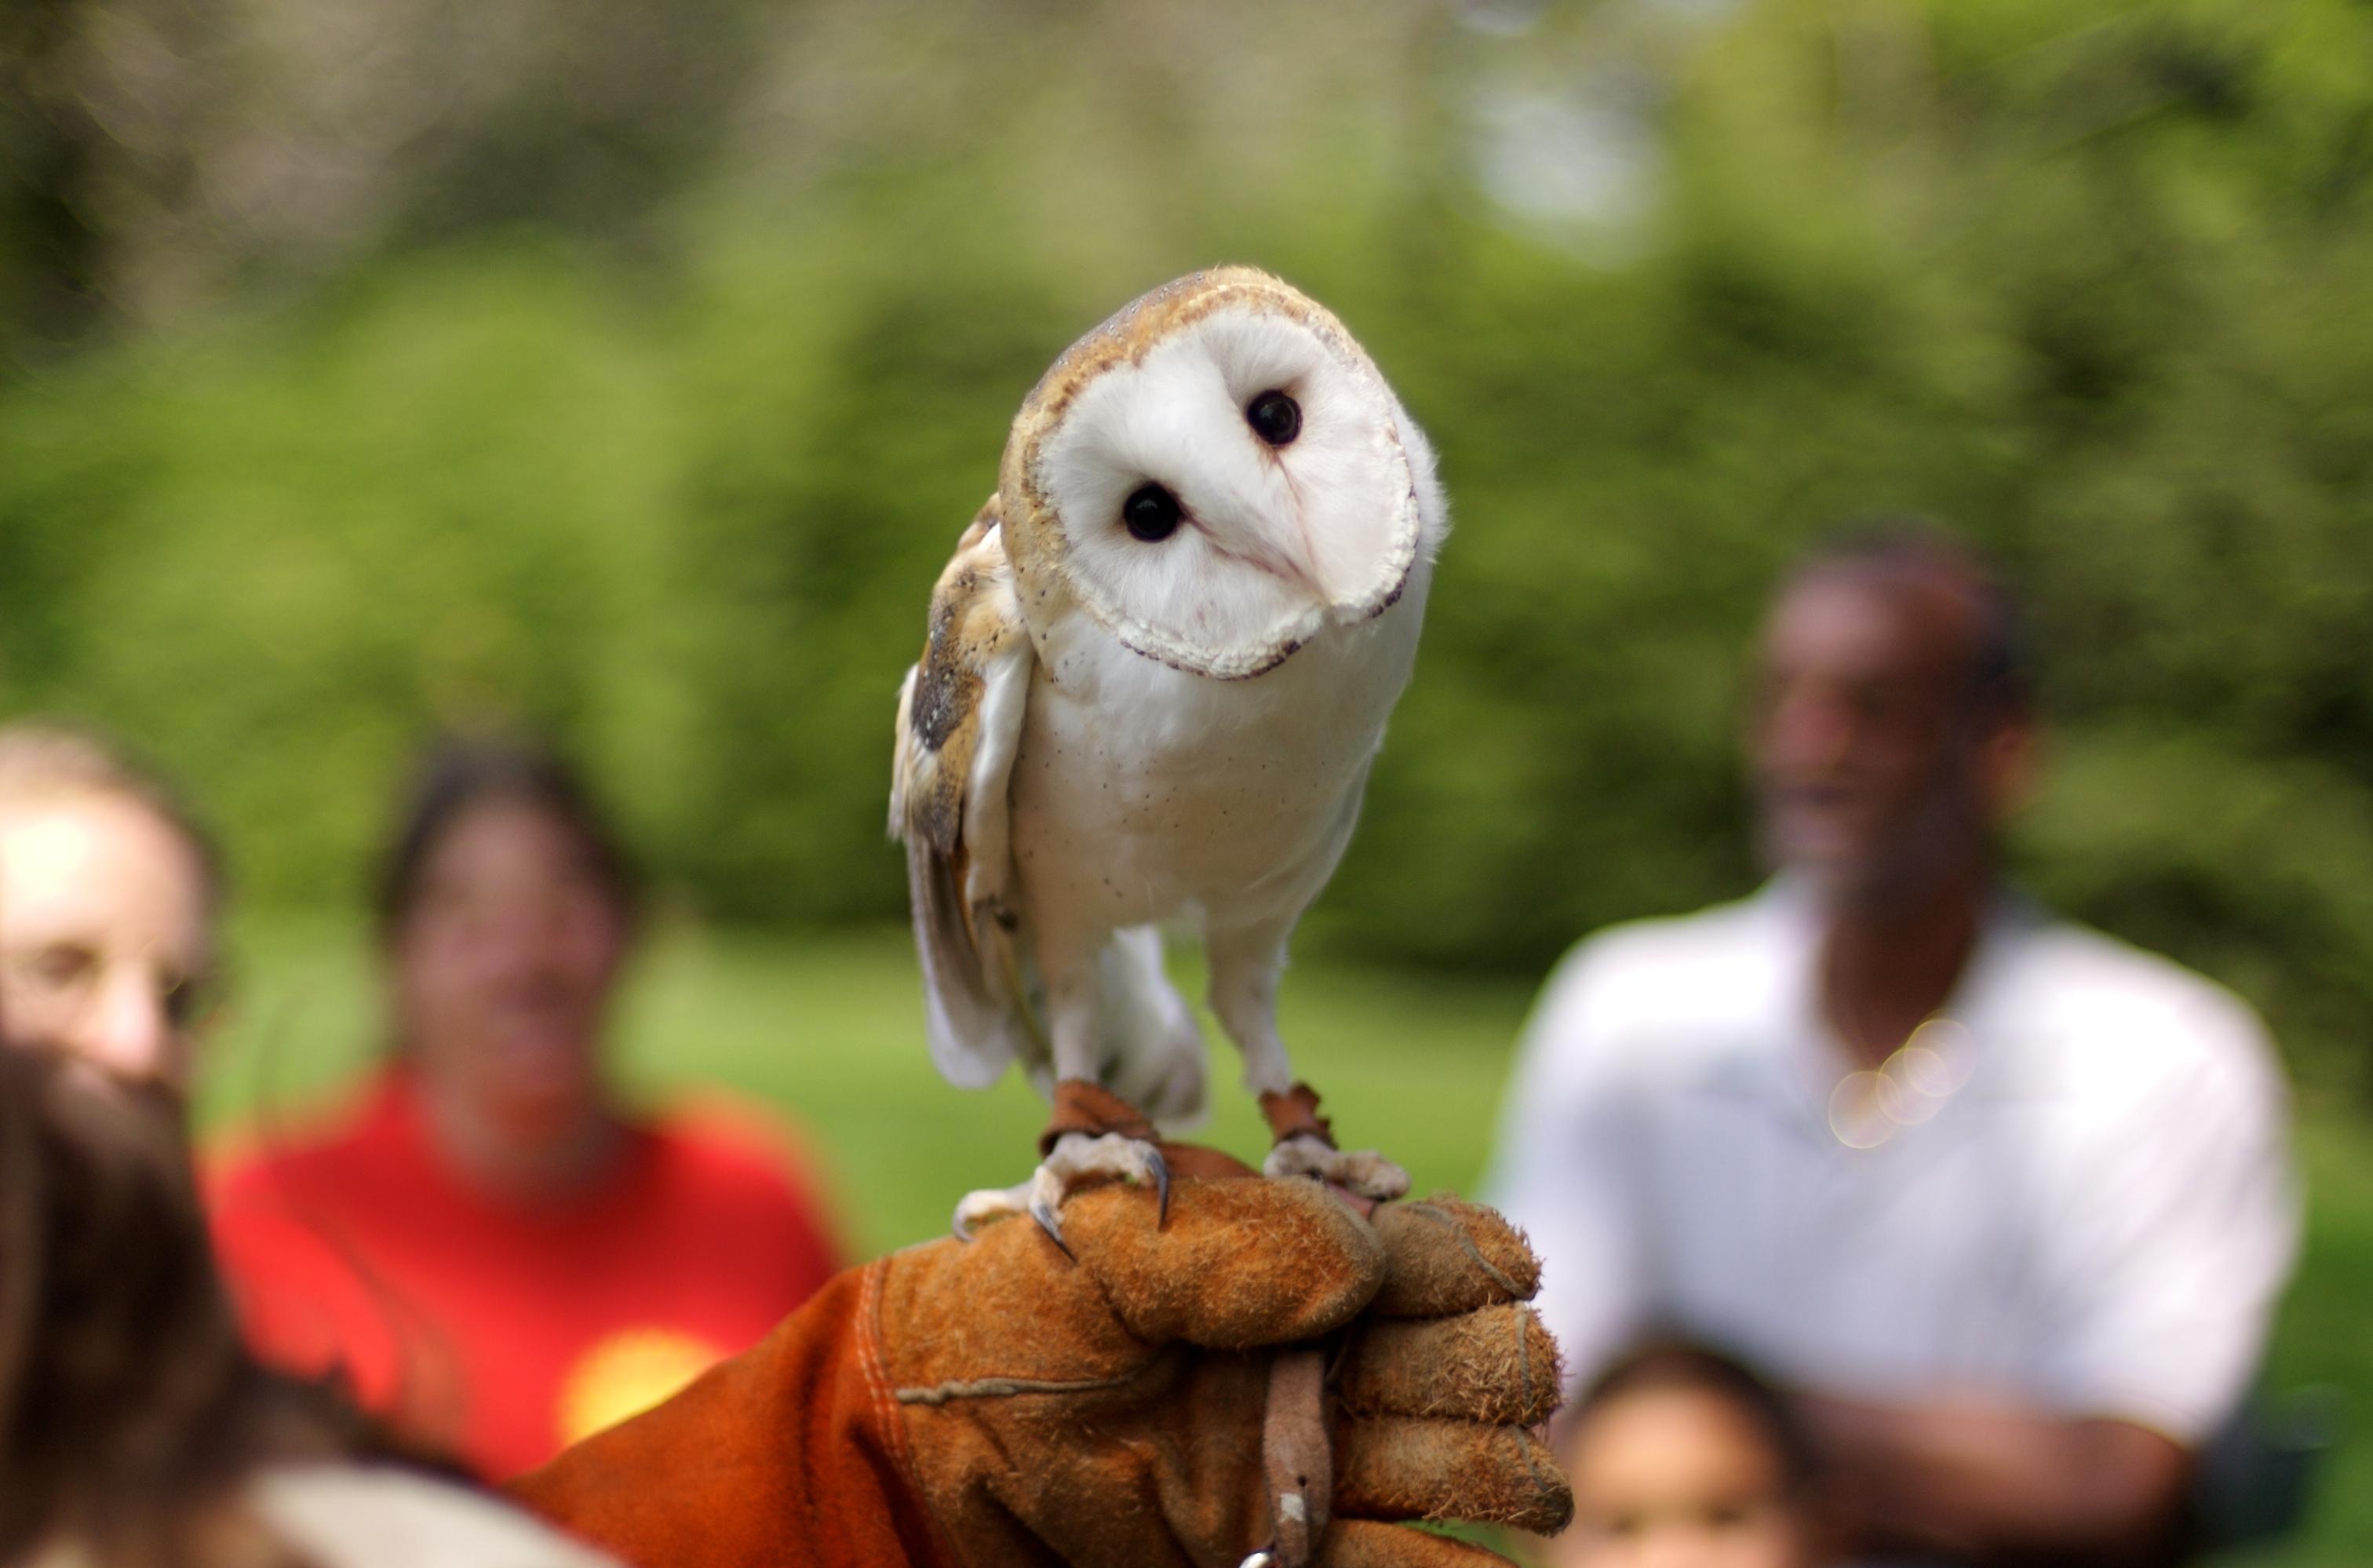 File:Barn Owl.jpg - Wikimedia Commons